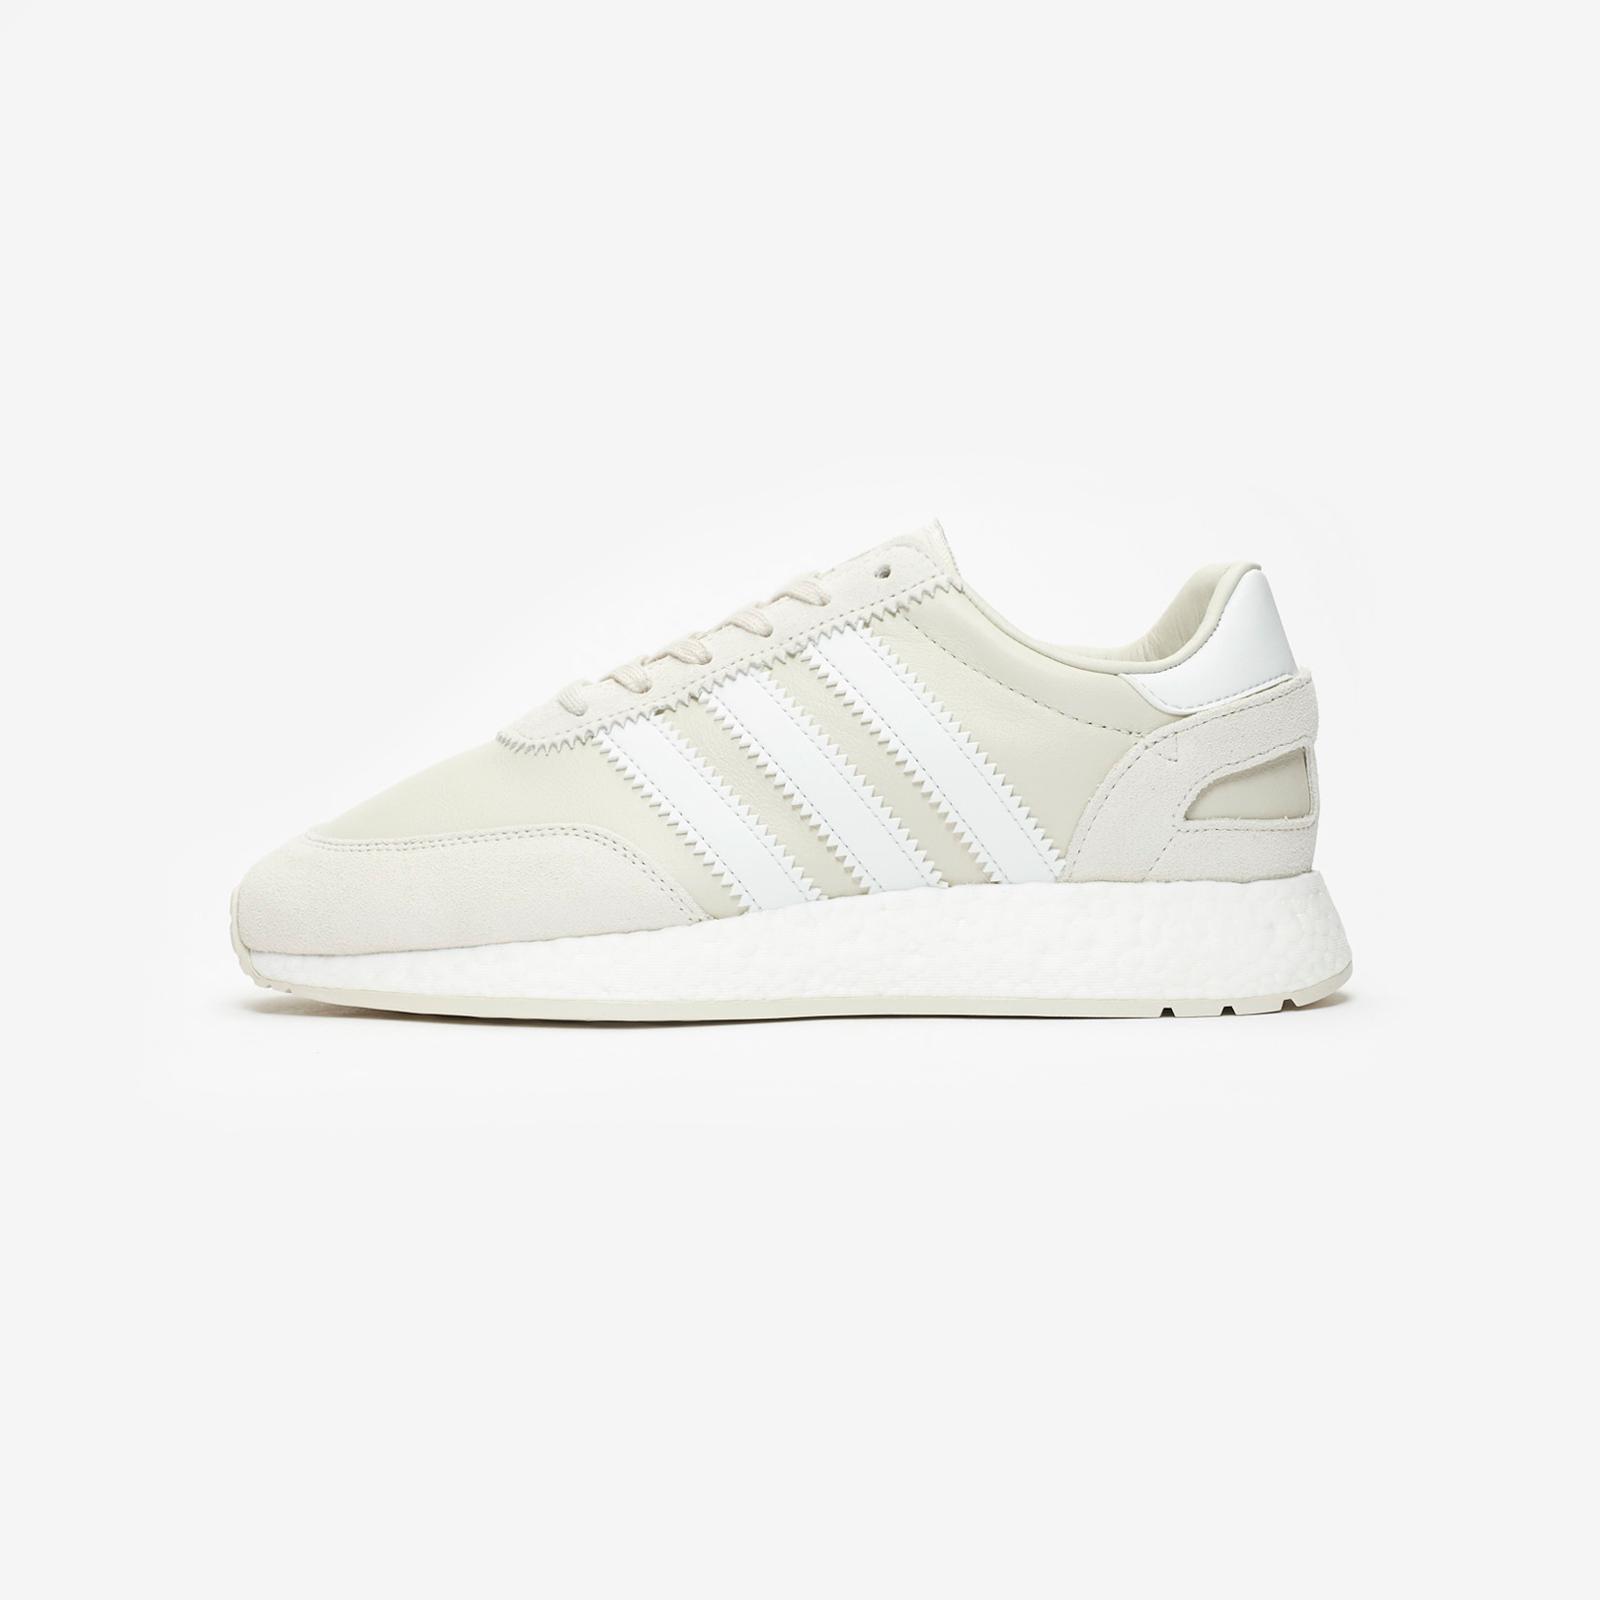 adidas I 5923 Bd7799 Sneakersnstuff I Sneakers